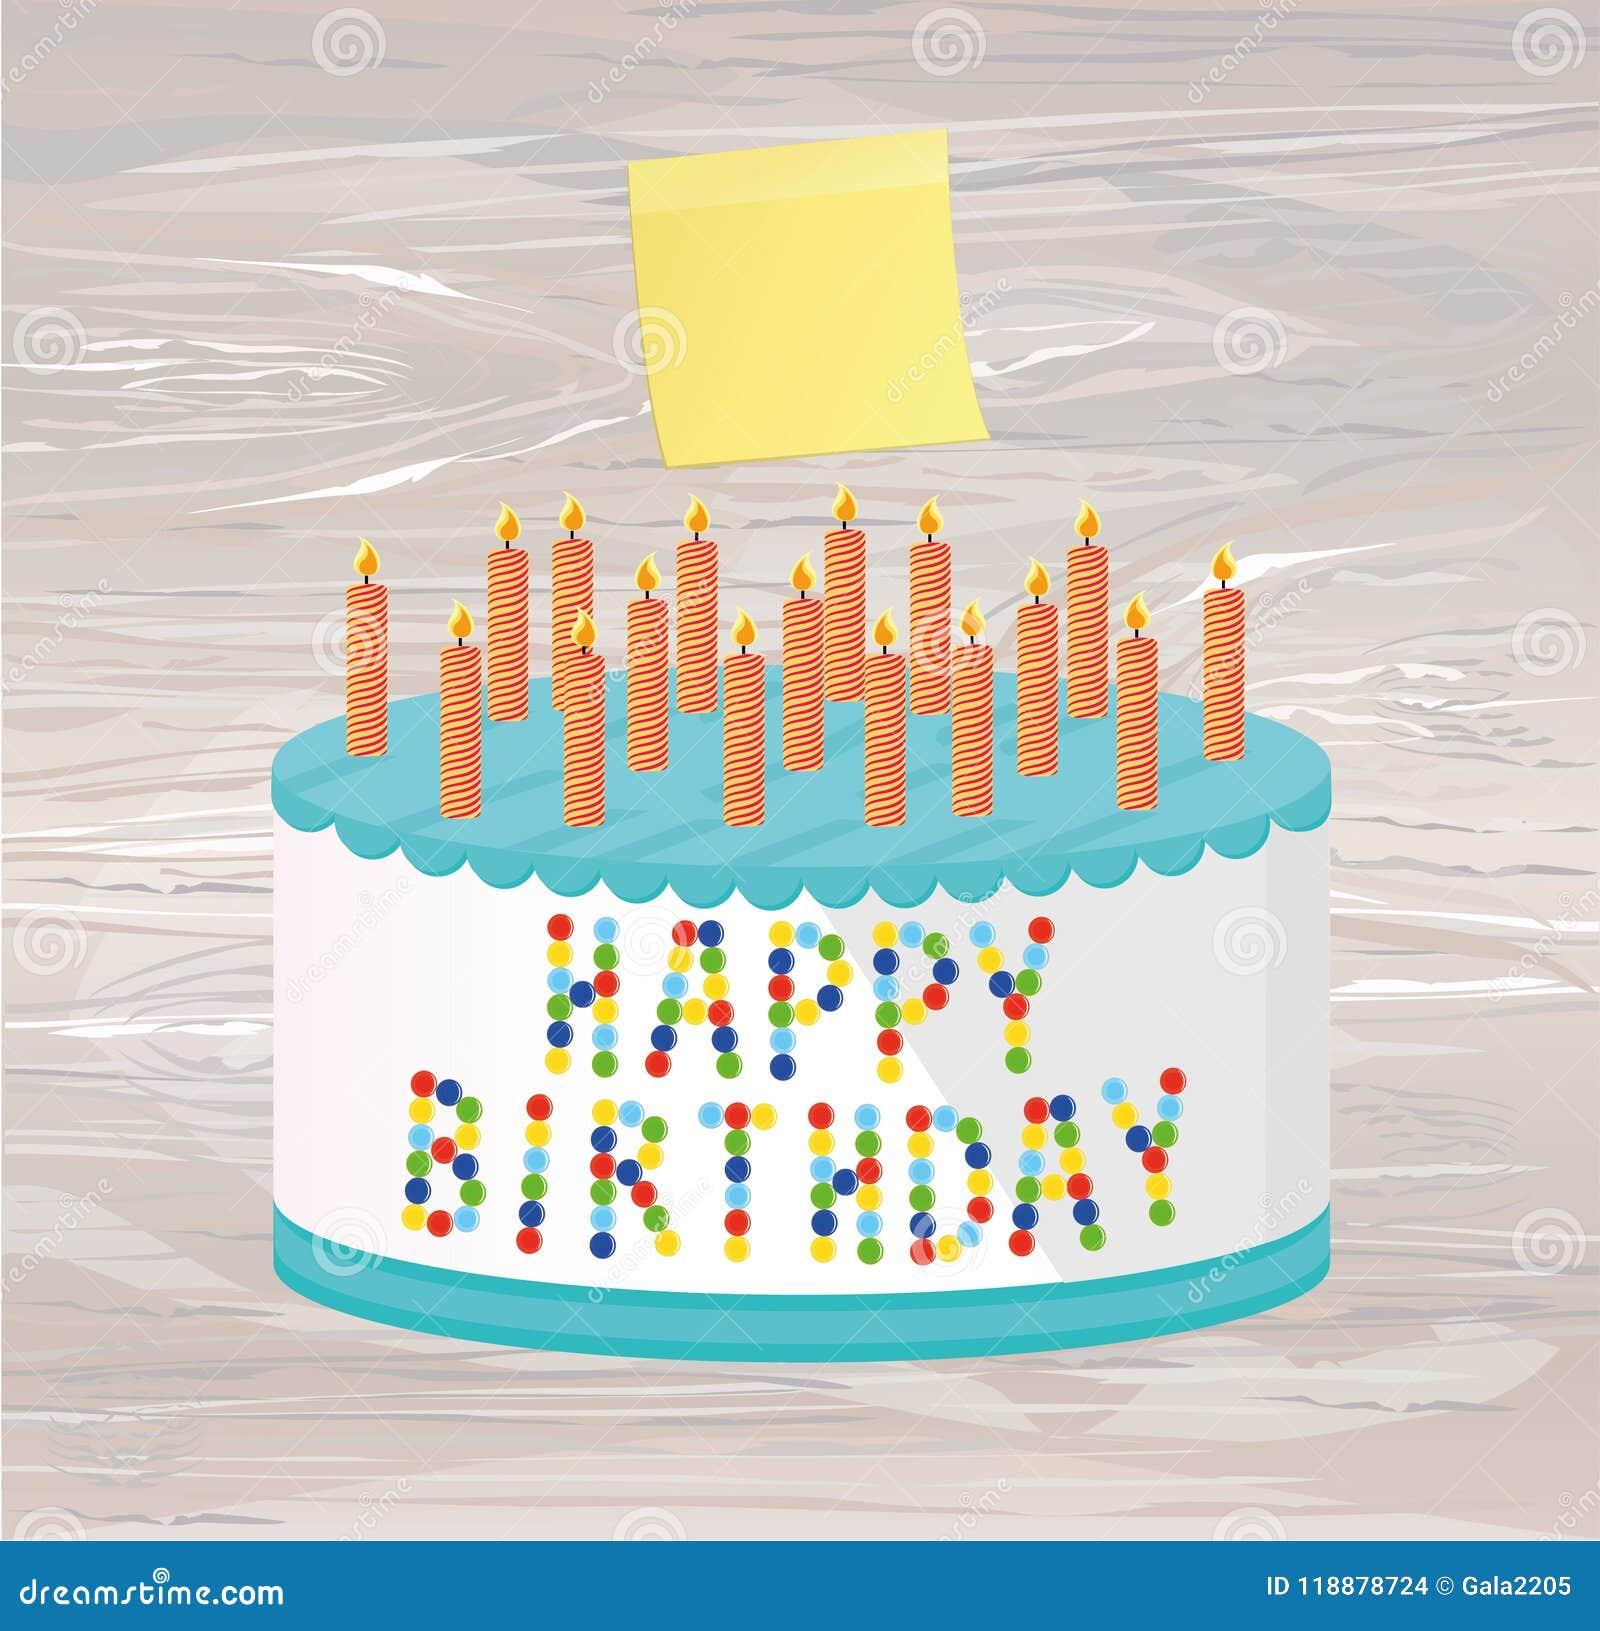 Festive Big Cake Happy Birthday Empty Yellow Sheet Of Paper F